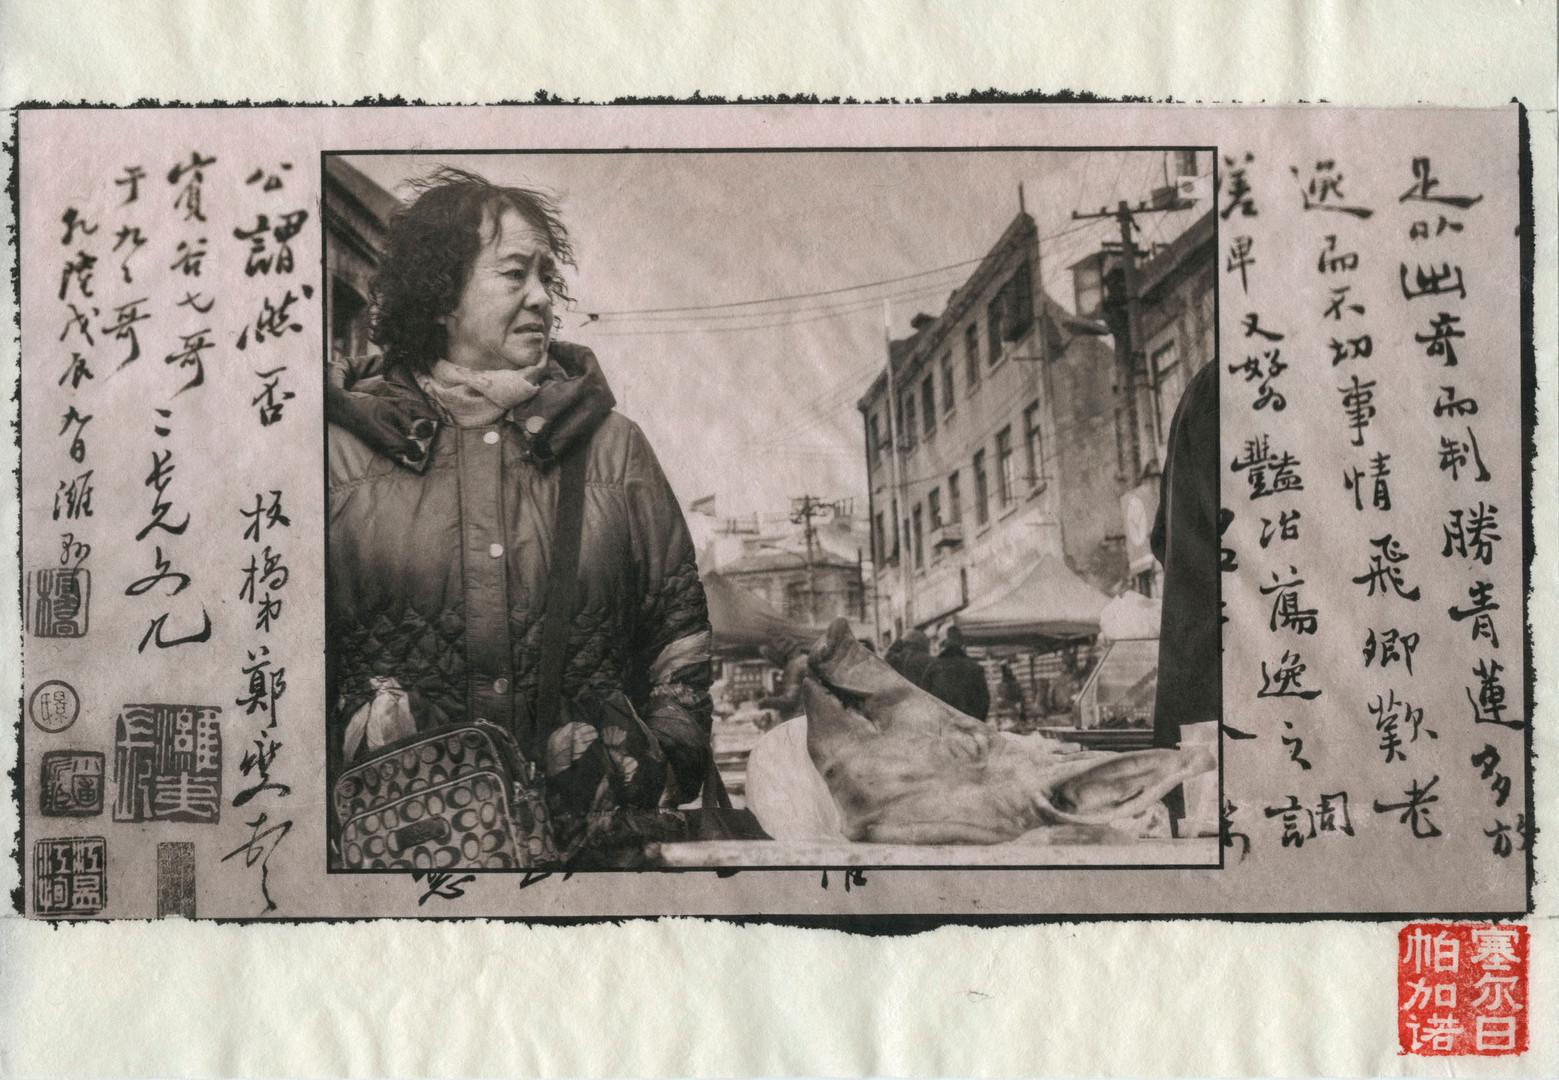 Qingdao02.jpg